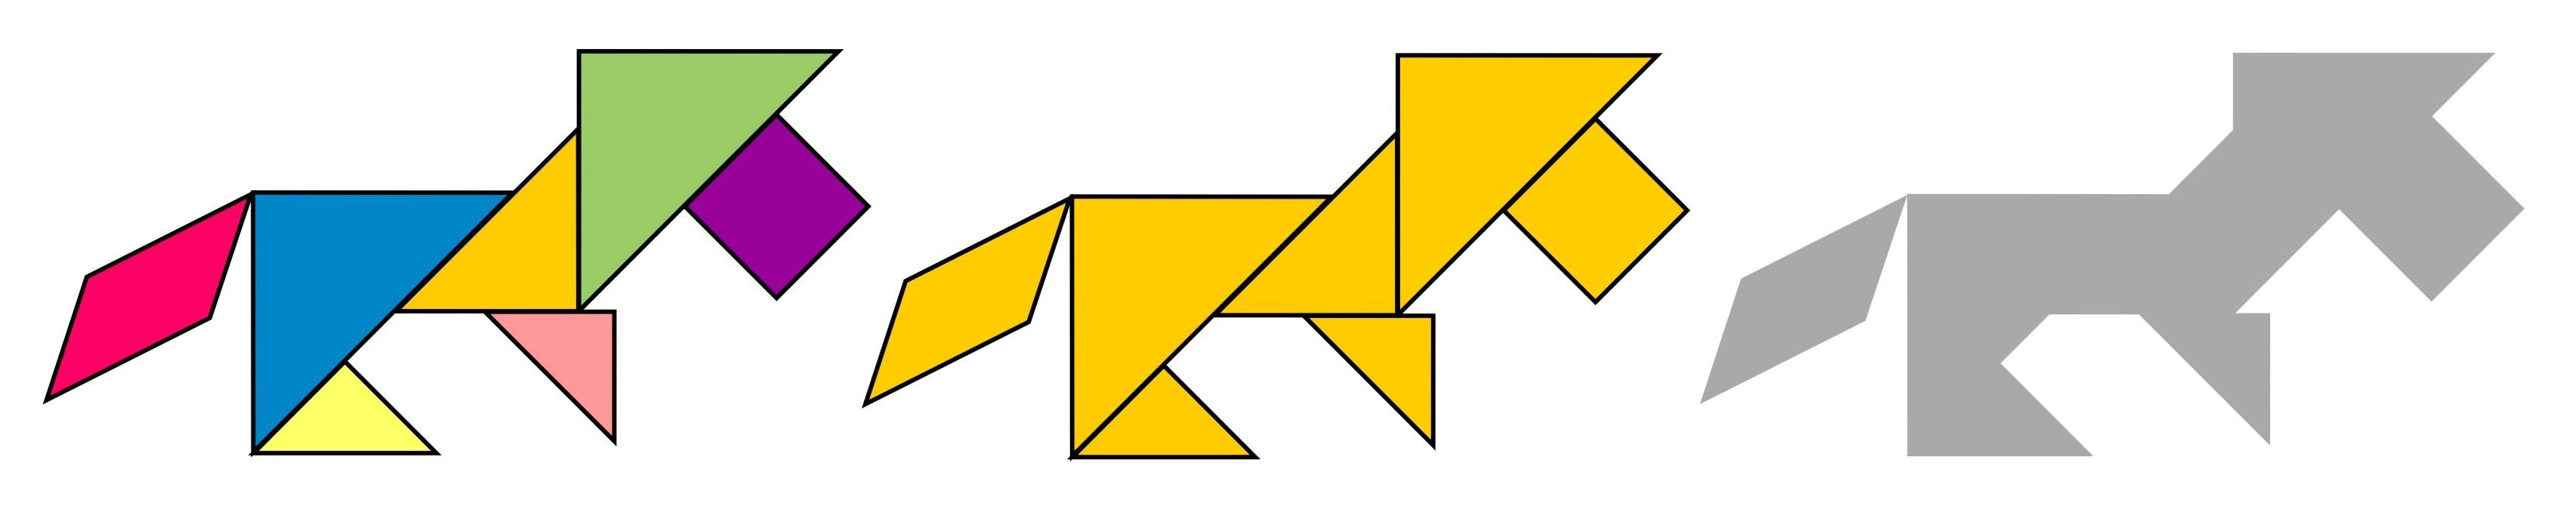 tangram-cirk-zadaniya